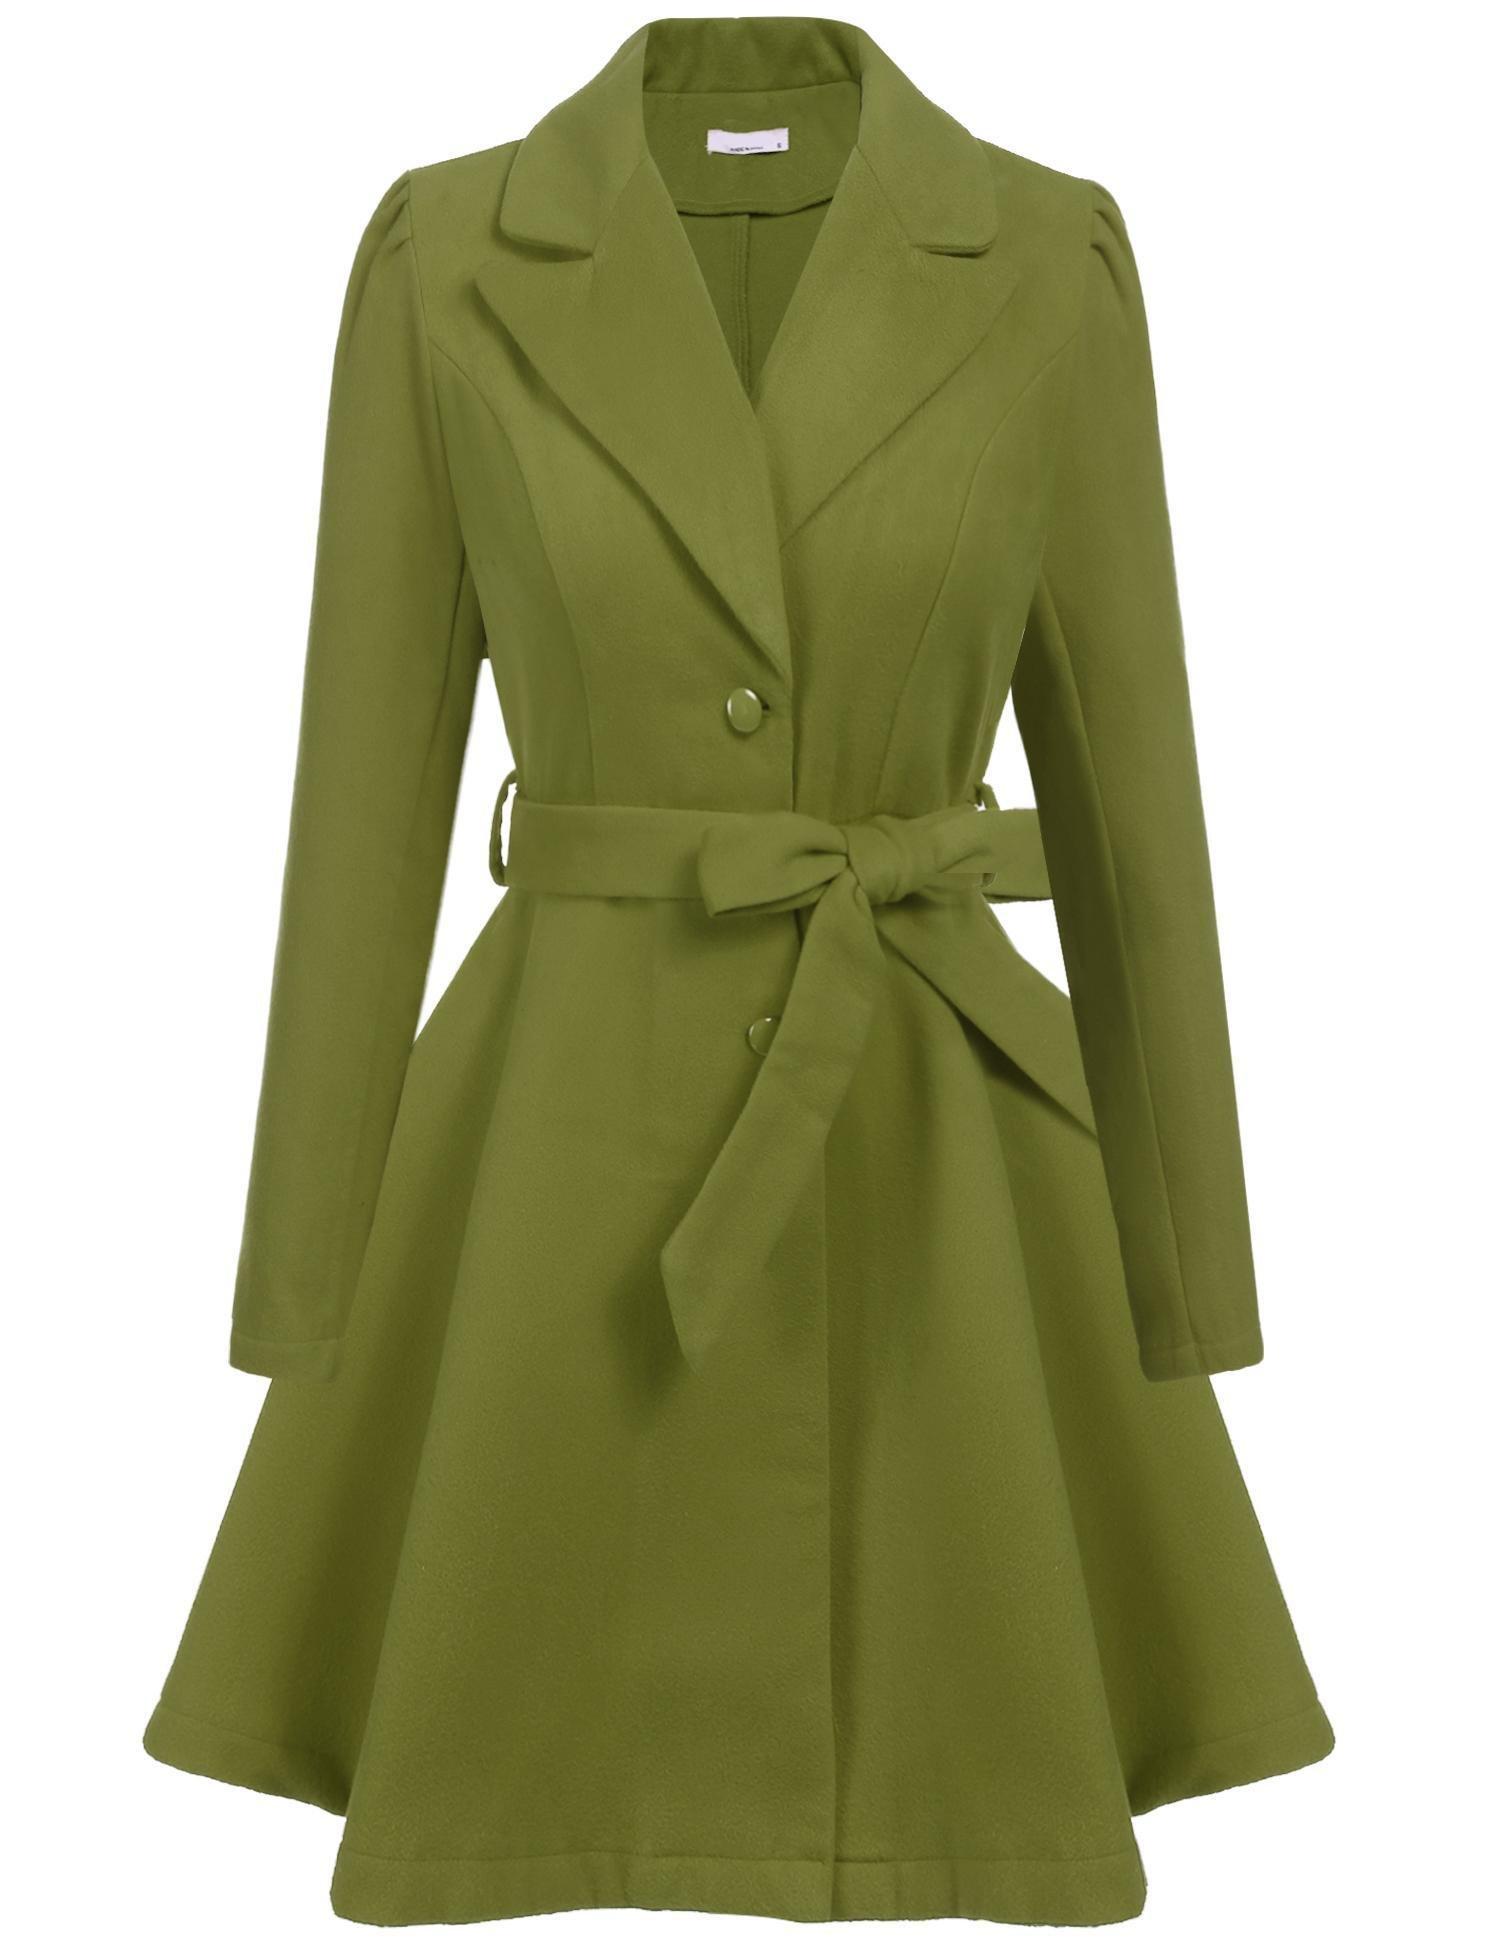 ELESOL Women's British Style Elegant Jacket Notched Lapel Long Trench Coat Green/XL